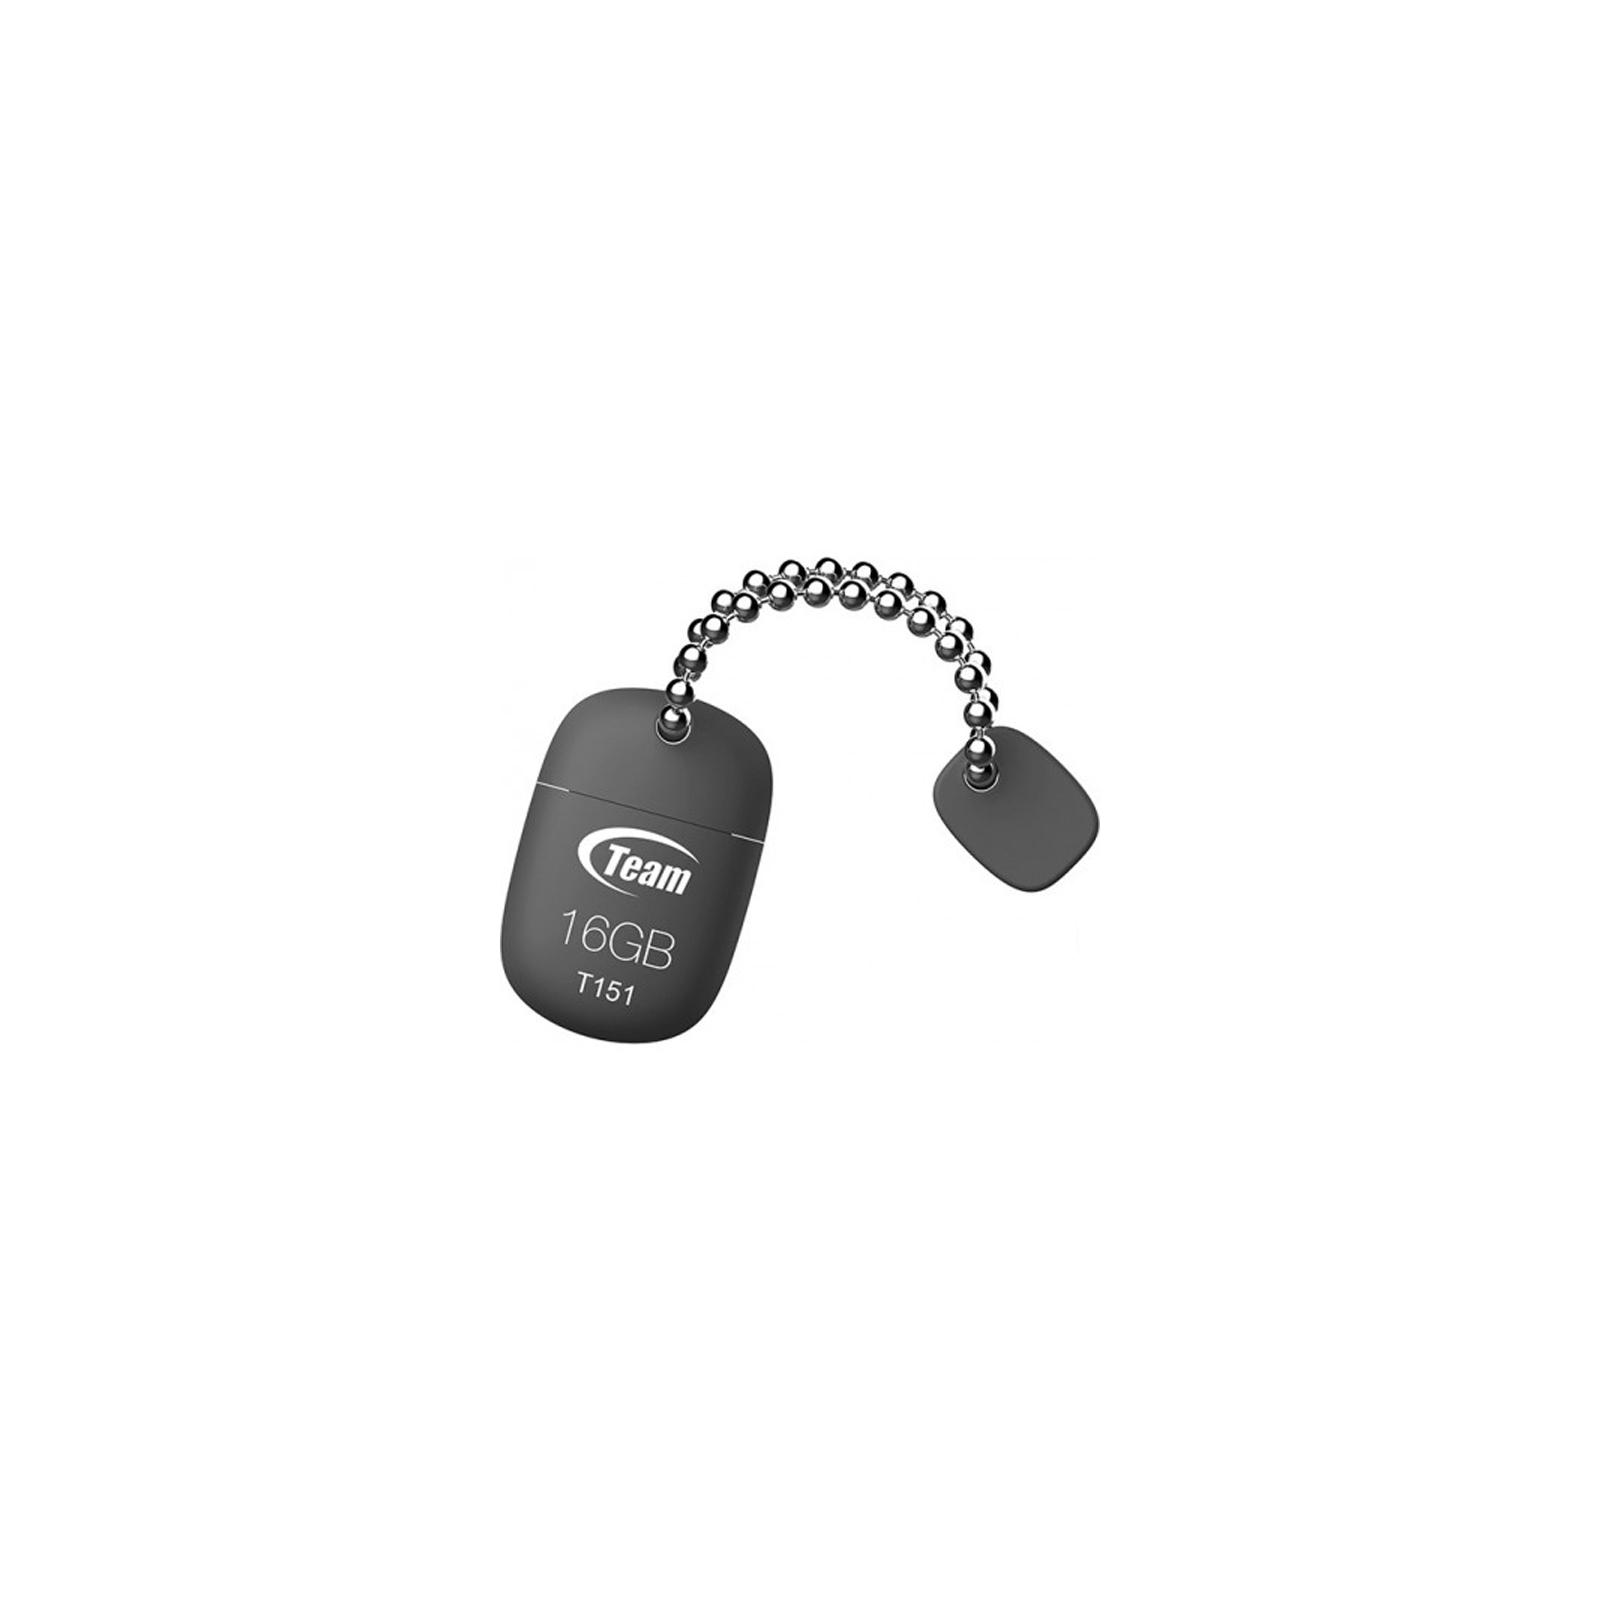 USB флеш накопитель Team 16GB T151 Grey USB 2.0 (TT15116GC01) изображение 2